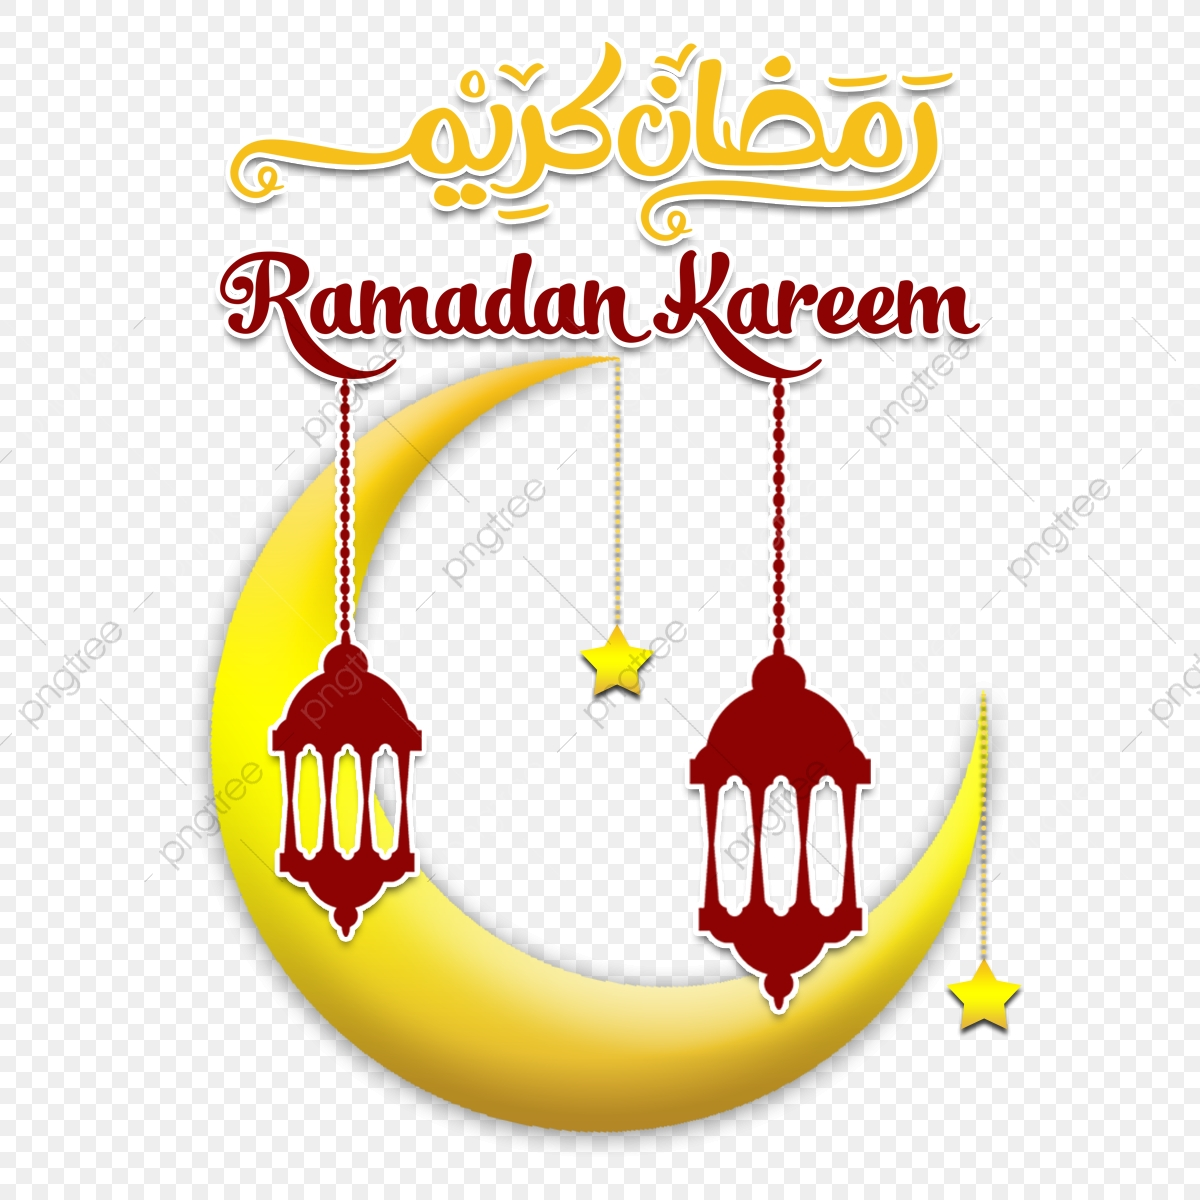 Vector Stock - Ramadan kareem design with mosque and moon. Clipart  Illustration gg77697933 - GoGraph